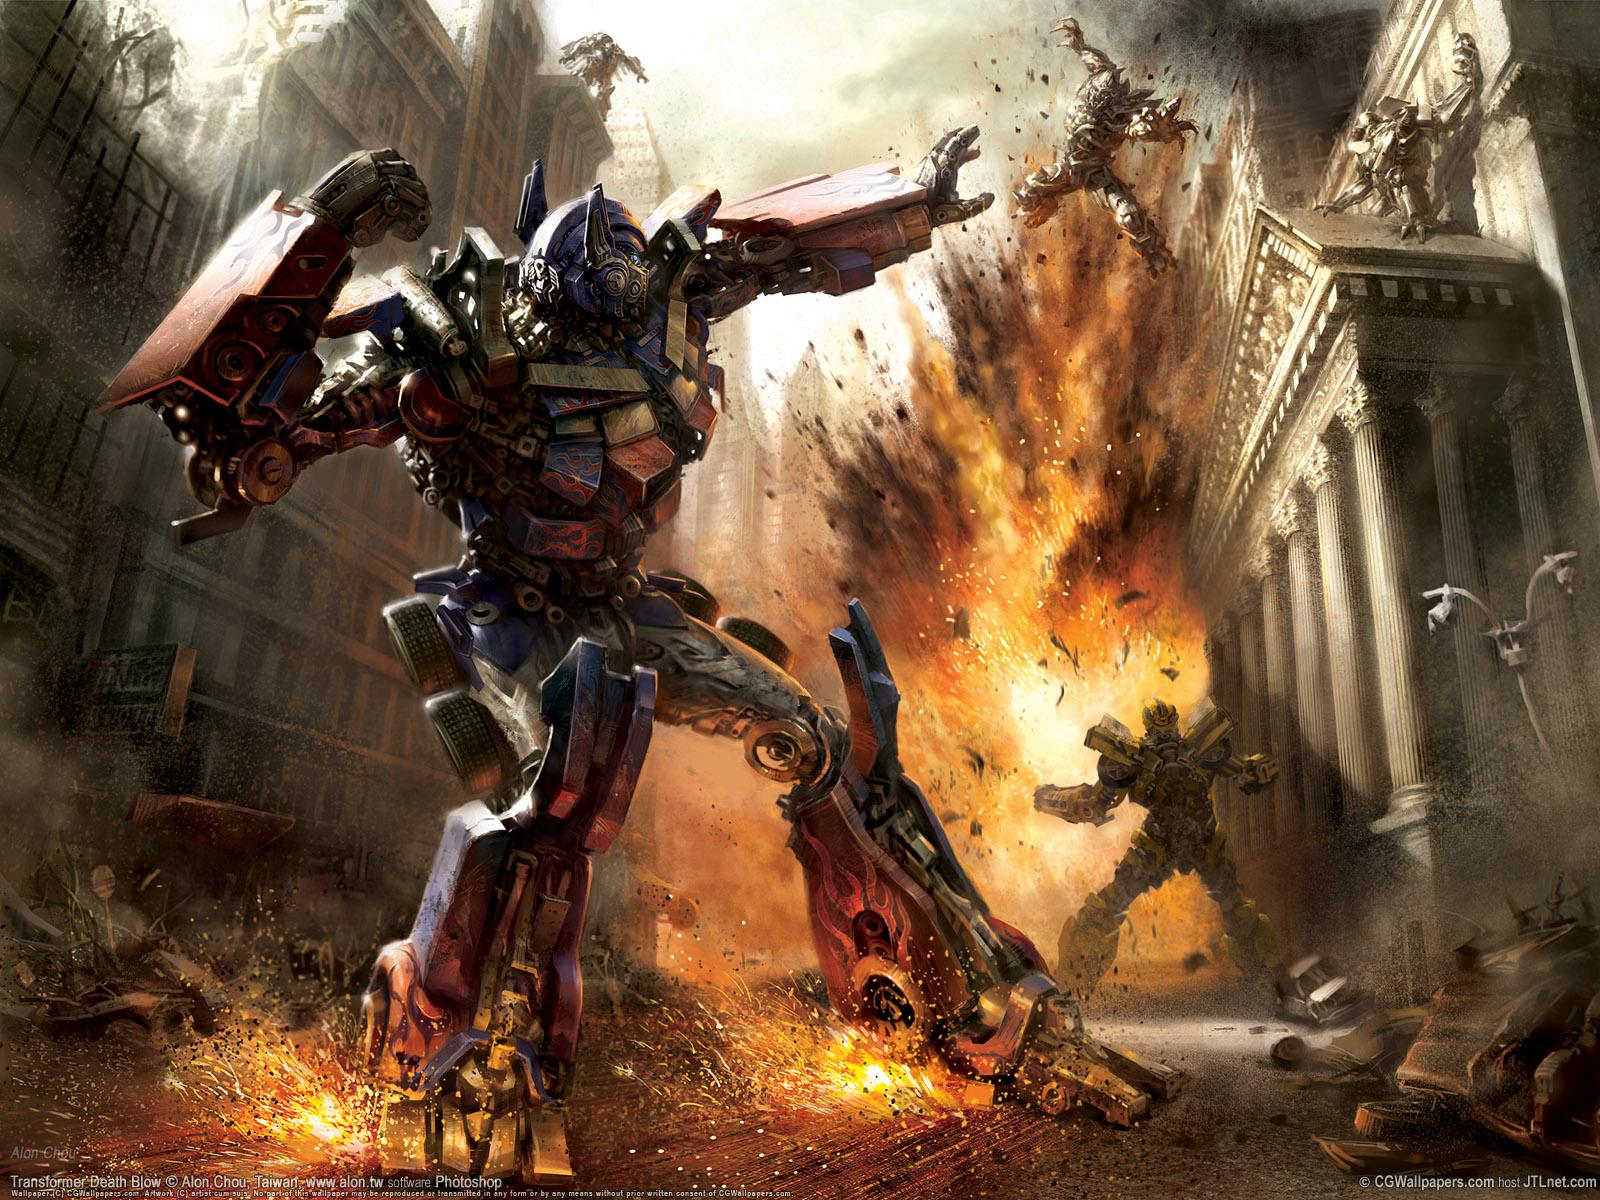 Shockwave Transformers Wallpapers Hdwpics